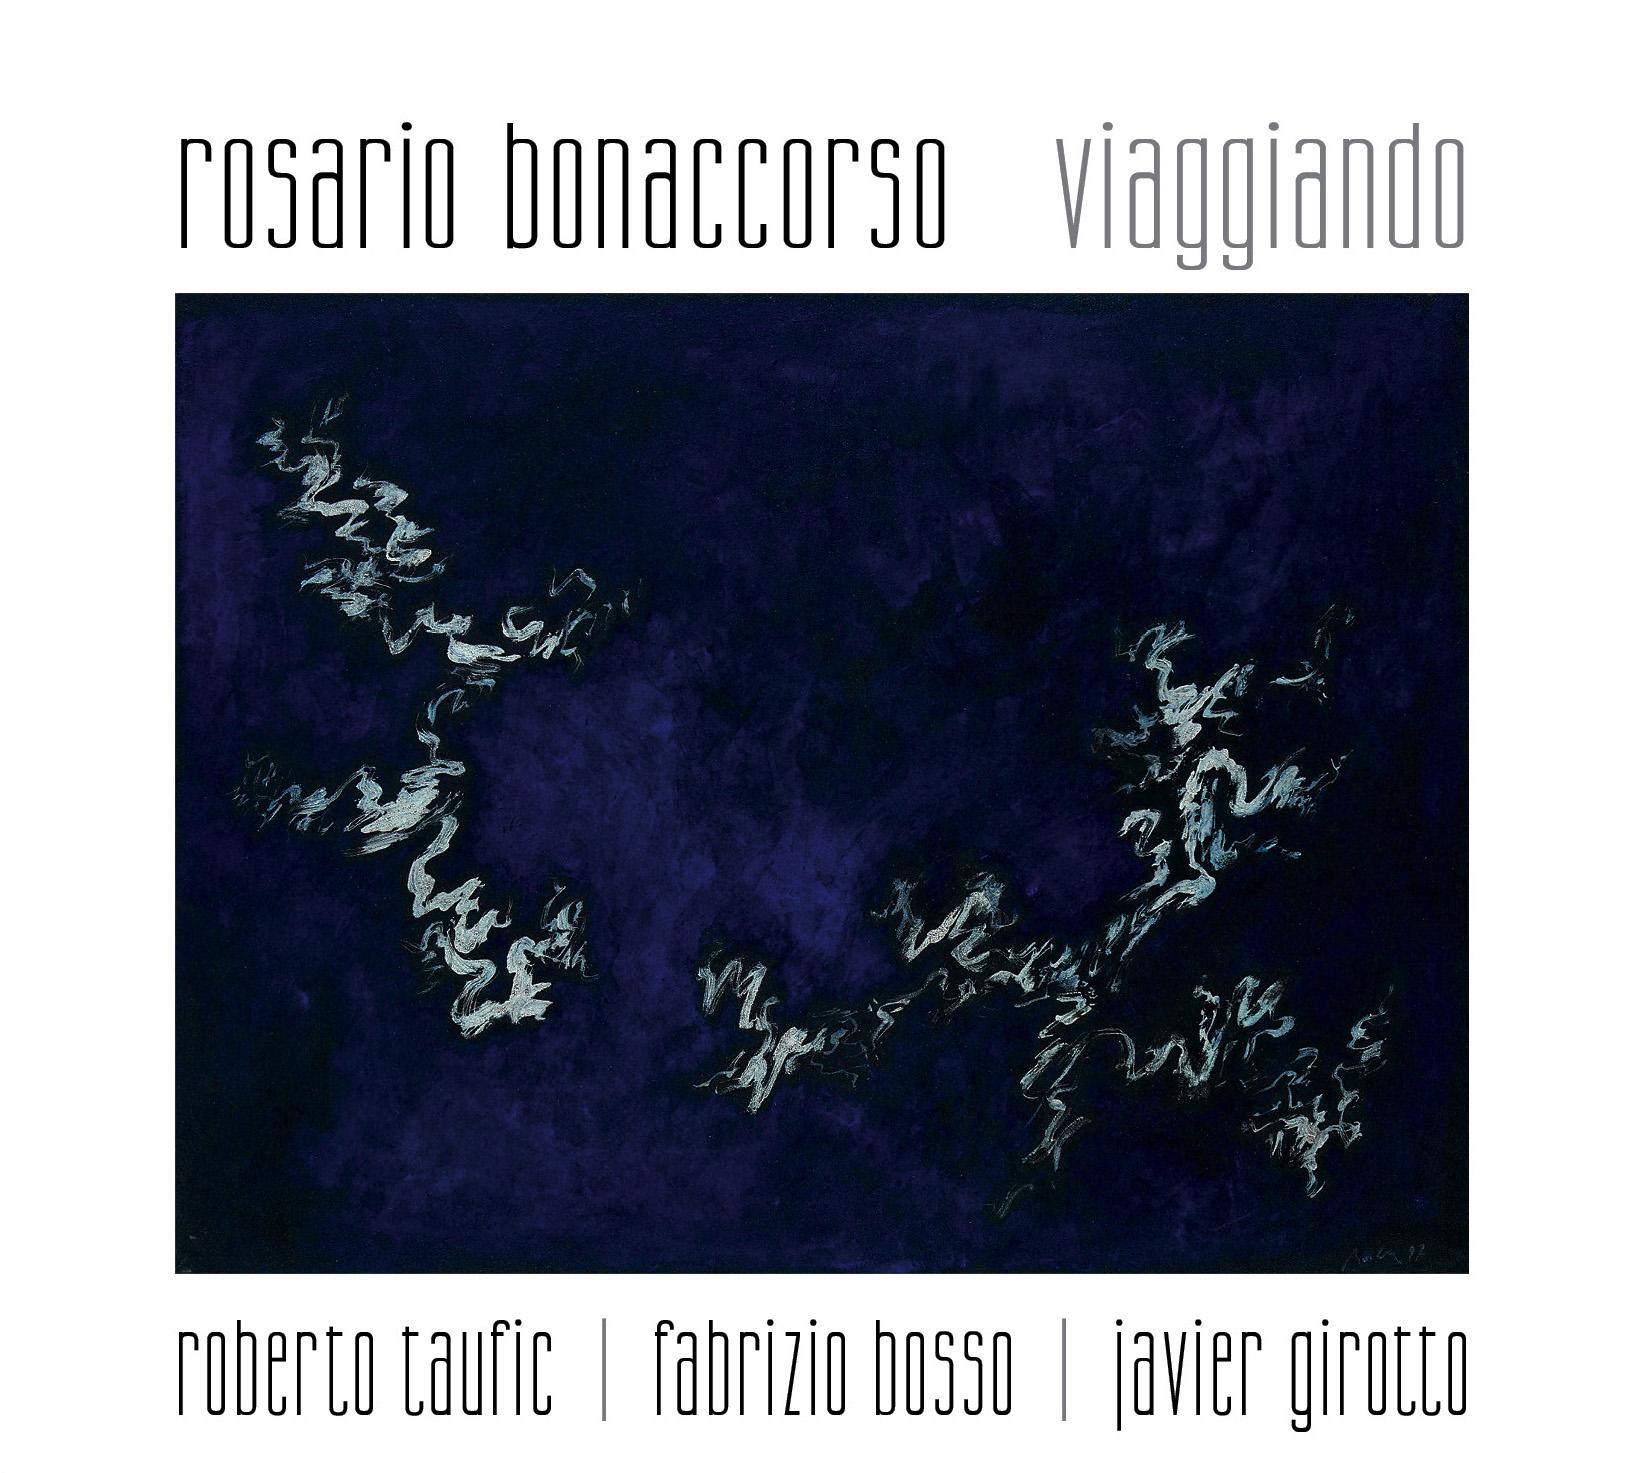 VIAGGIANDO cd cover PRINT 1